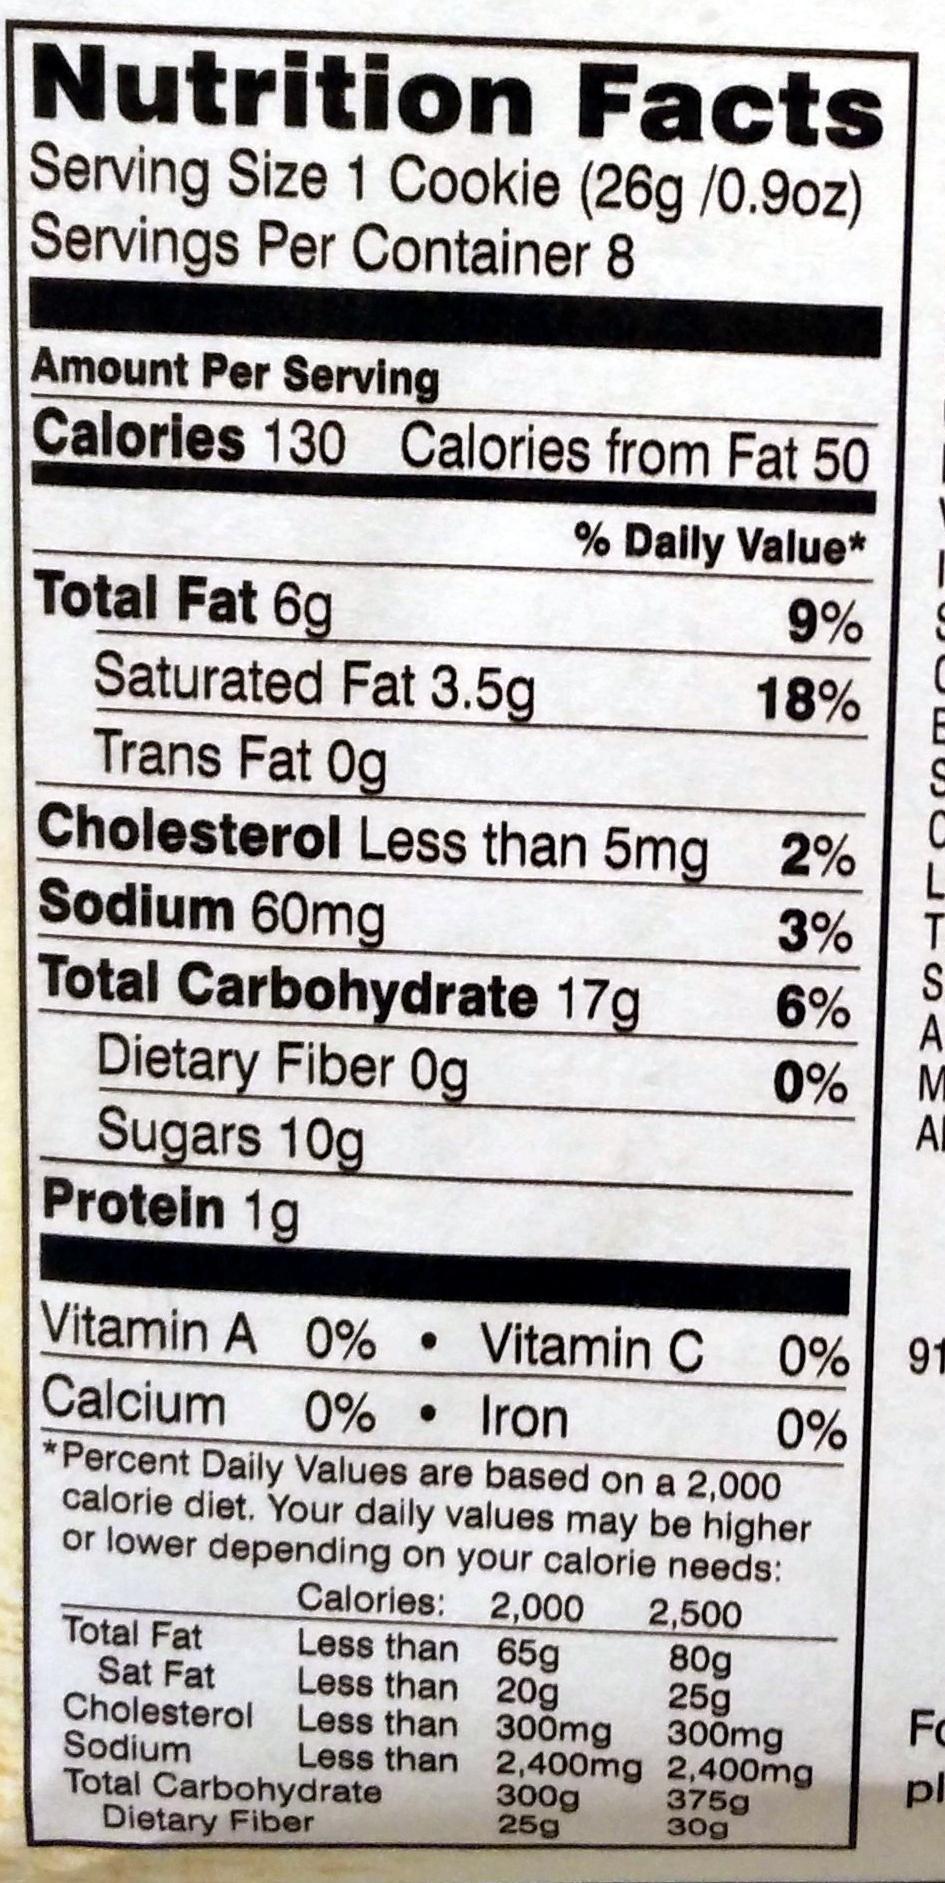 Pepperidge farm cookies milk choc - Nutrition facts - en